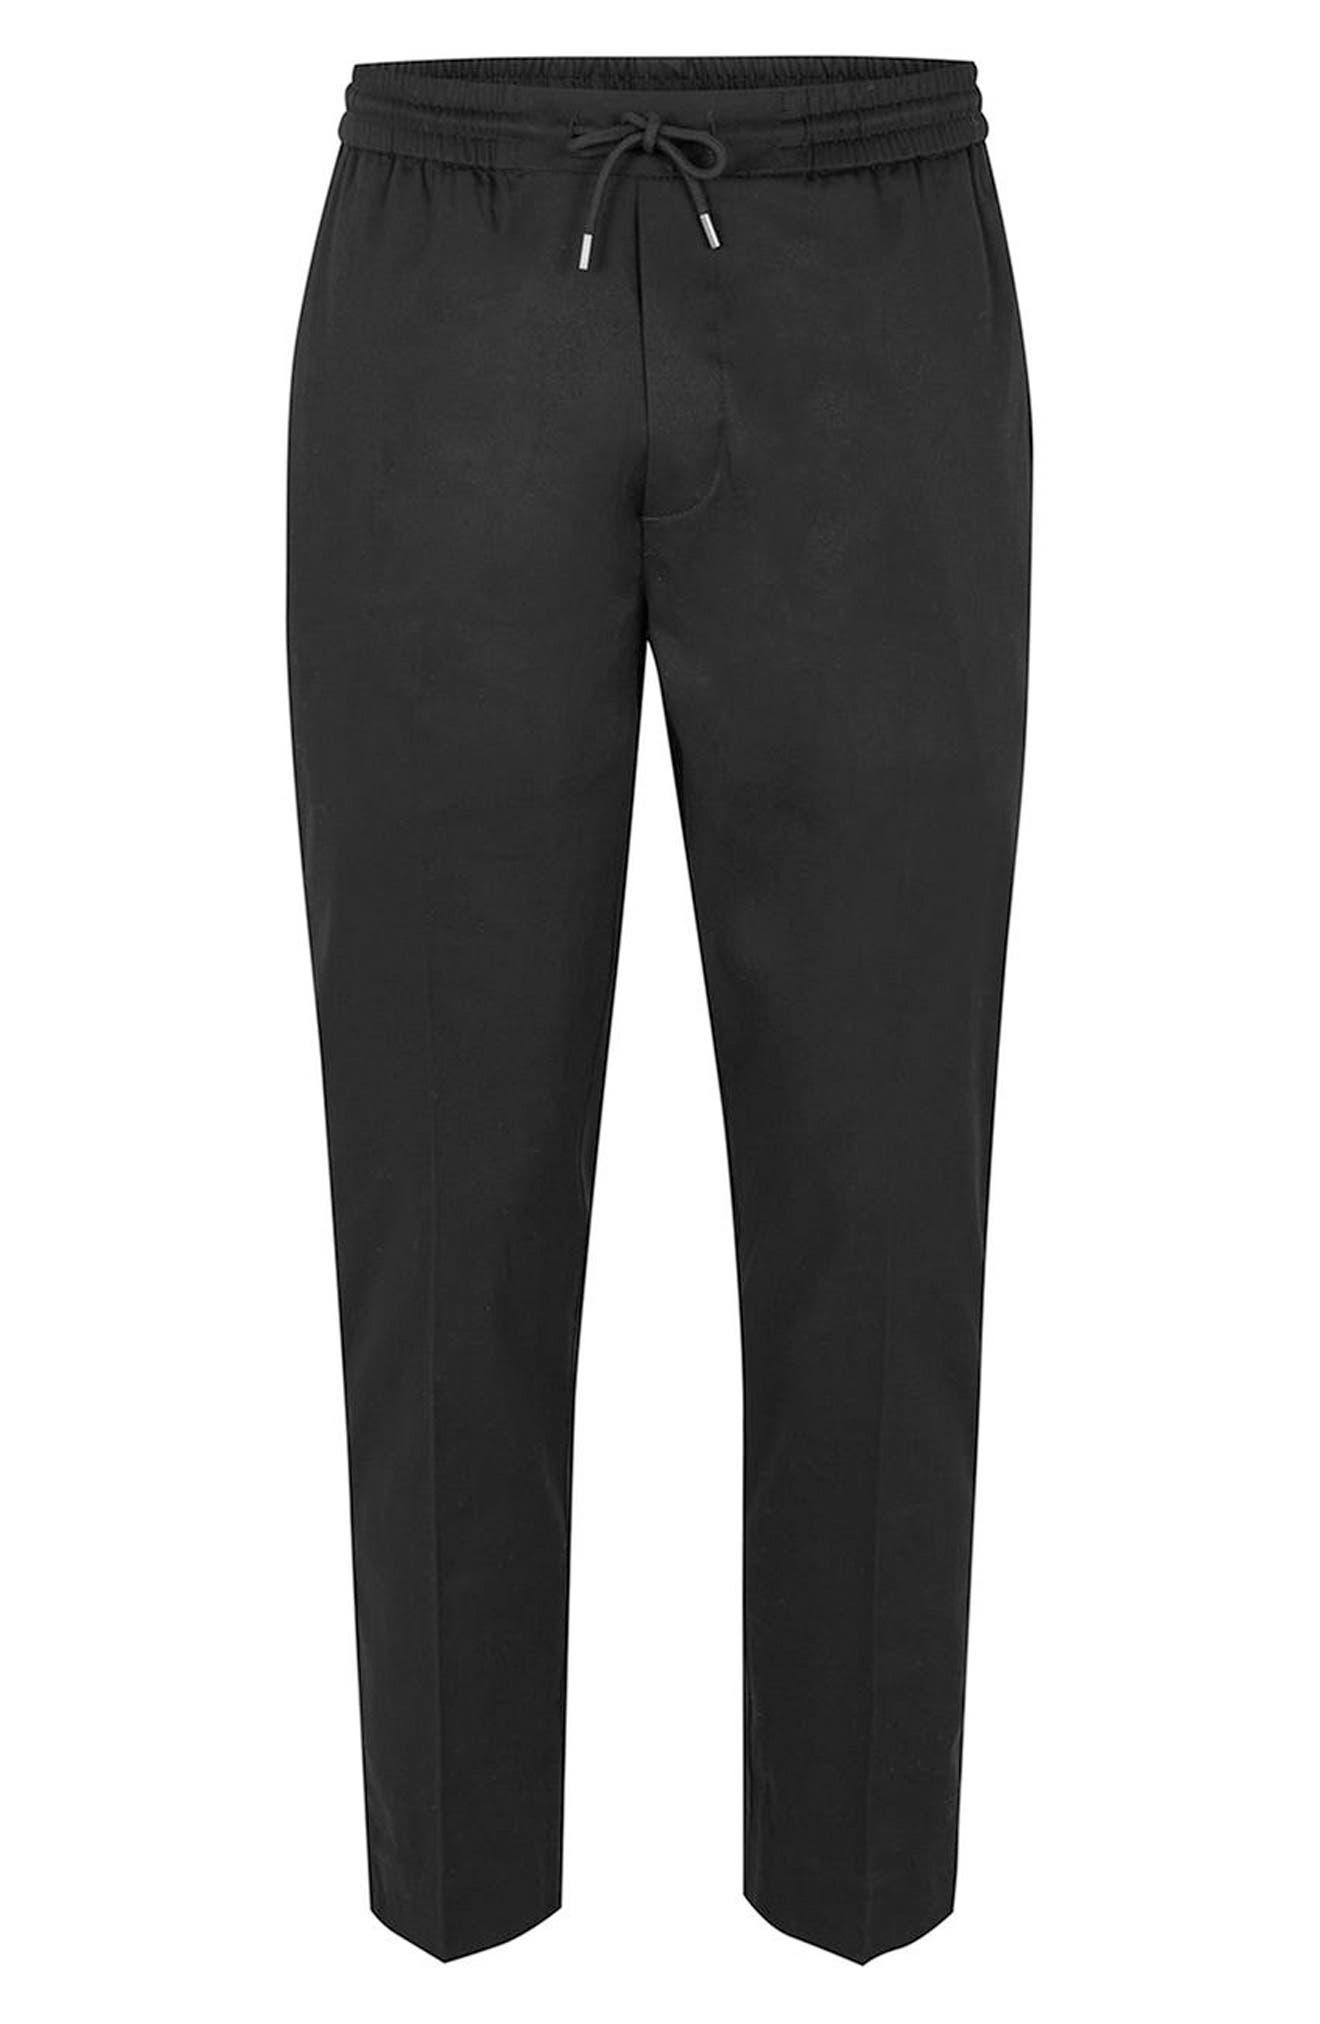 Jazzy Side Stripe Jogger Pants,                             Alternate thumbnail 4, color,                             Black Multi